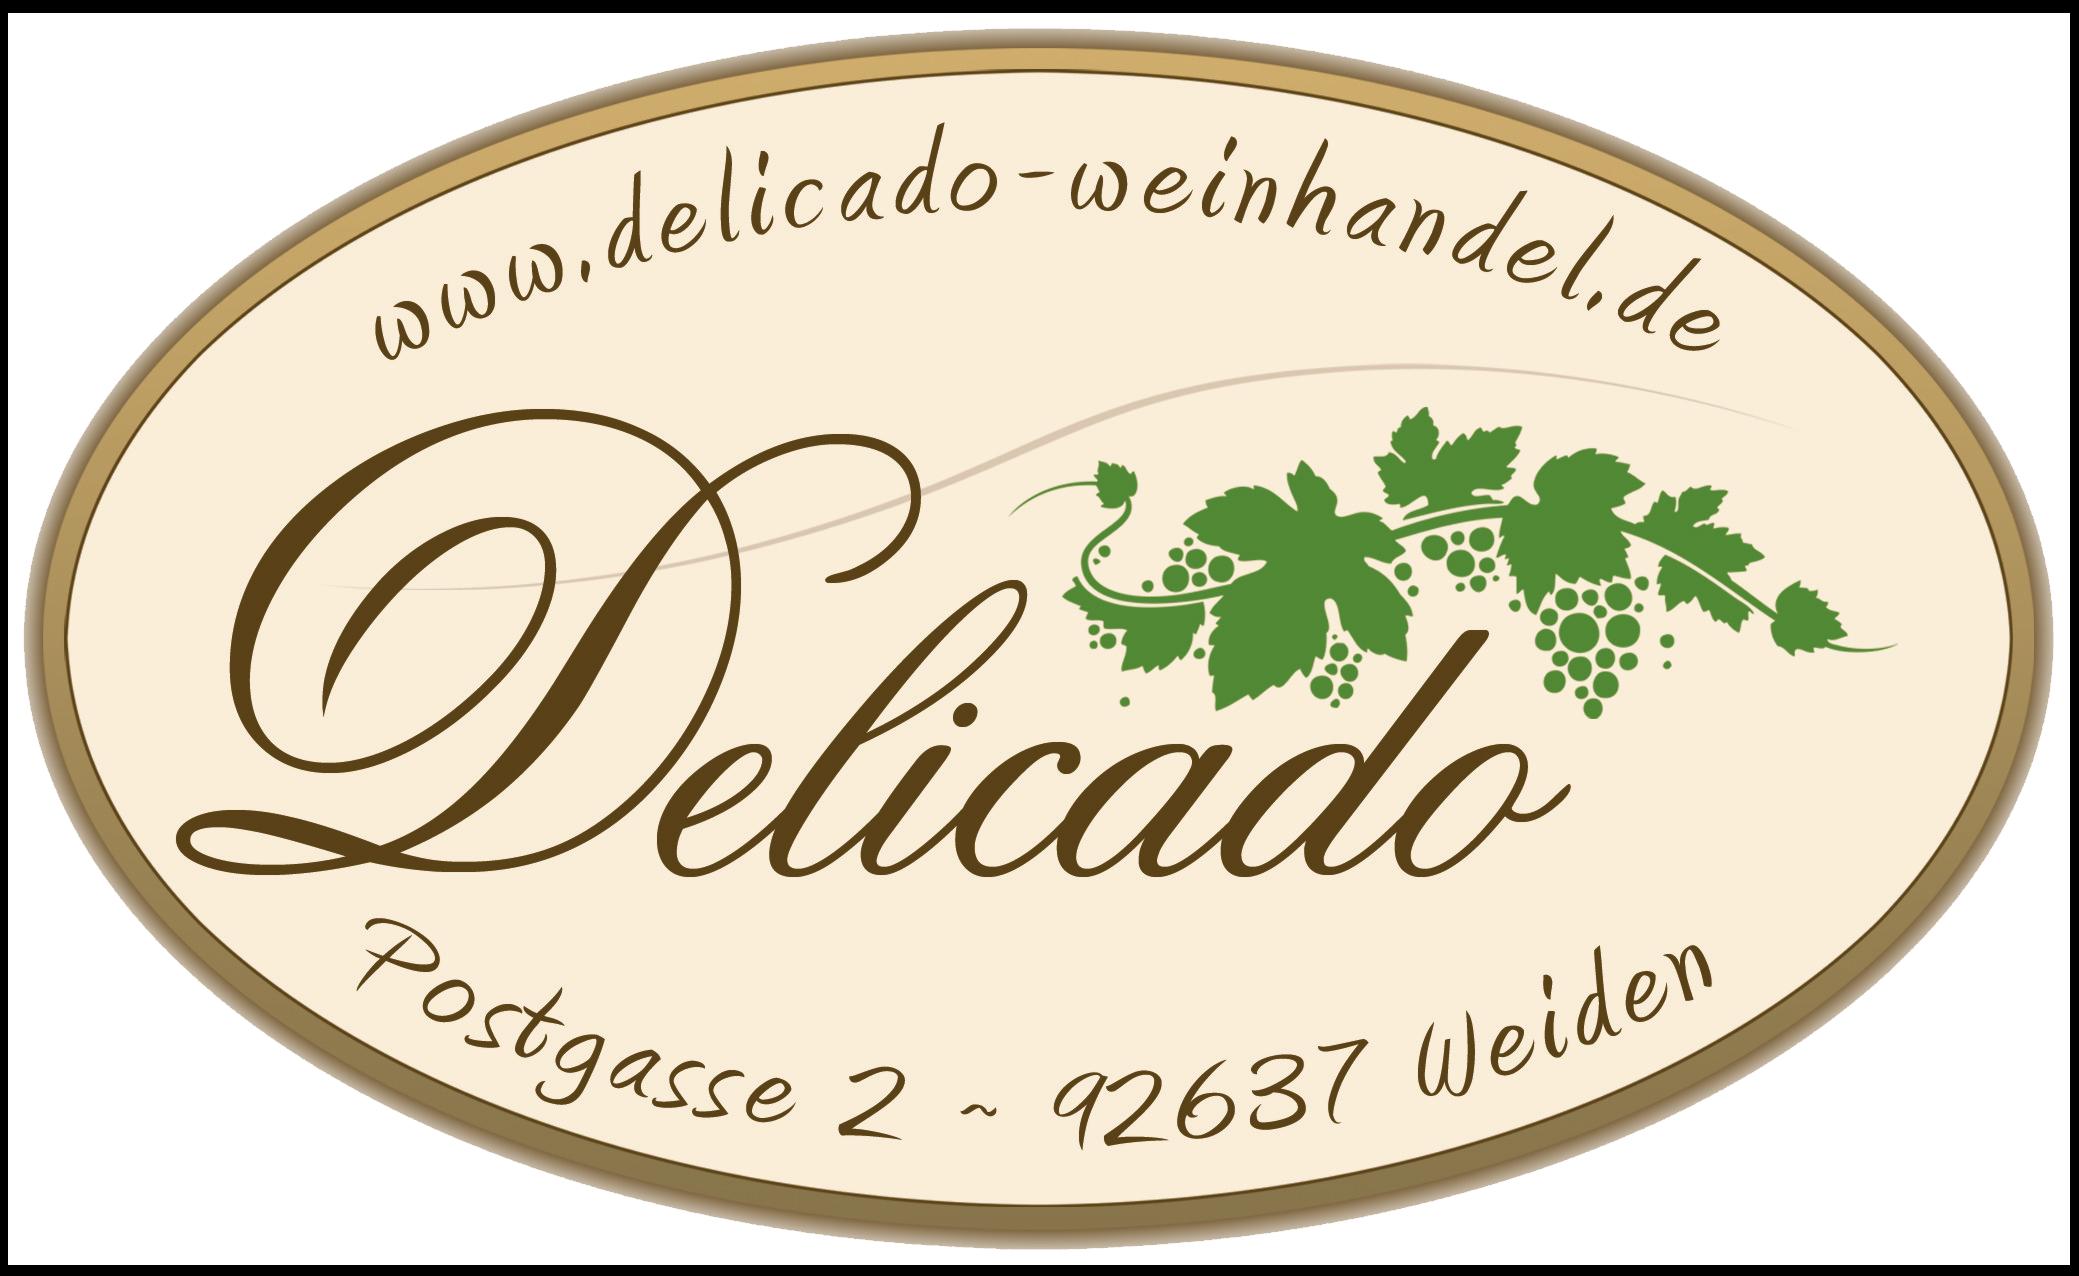 Delicado Weinhandel & Feinkost